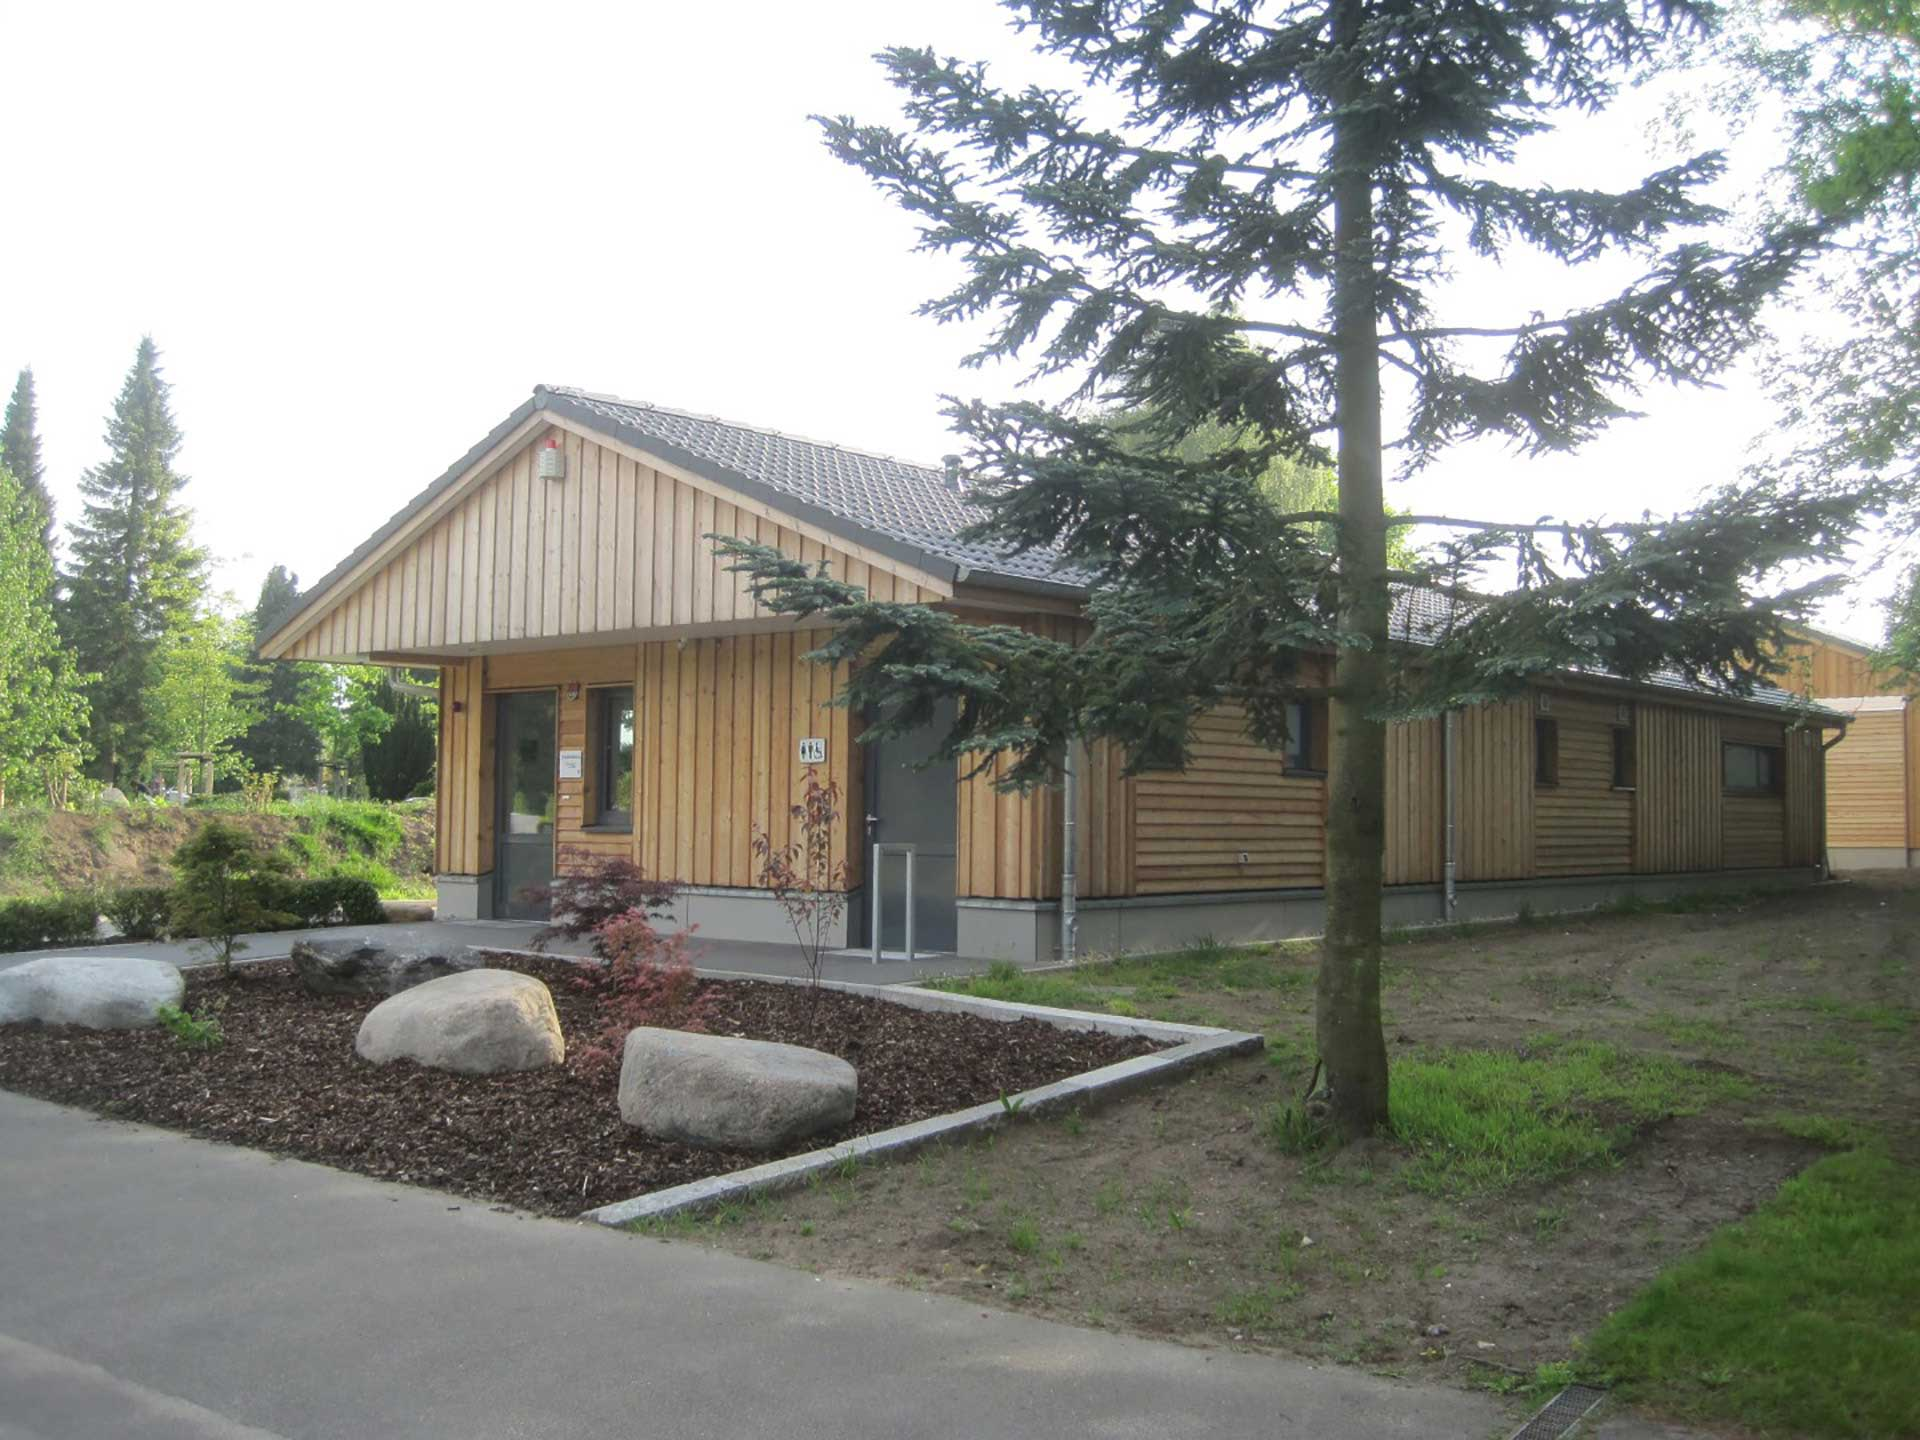 01-janiak-lippert_Betriebsgebaeude-Friedhof-Buedelsdorf